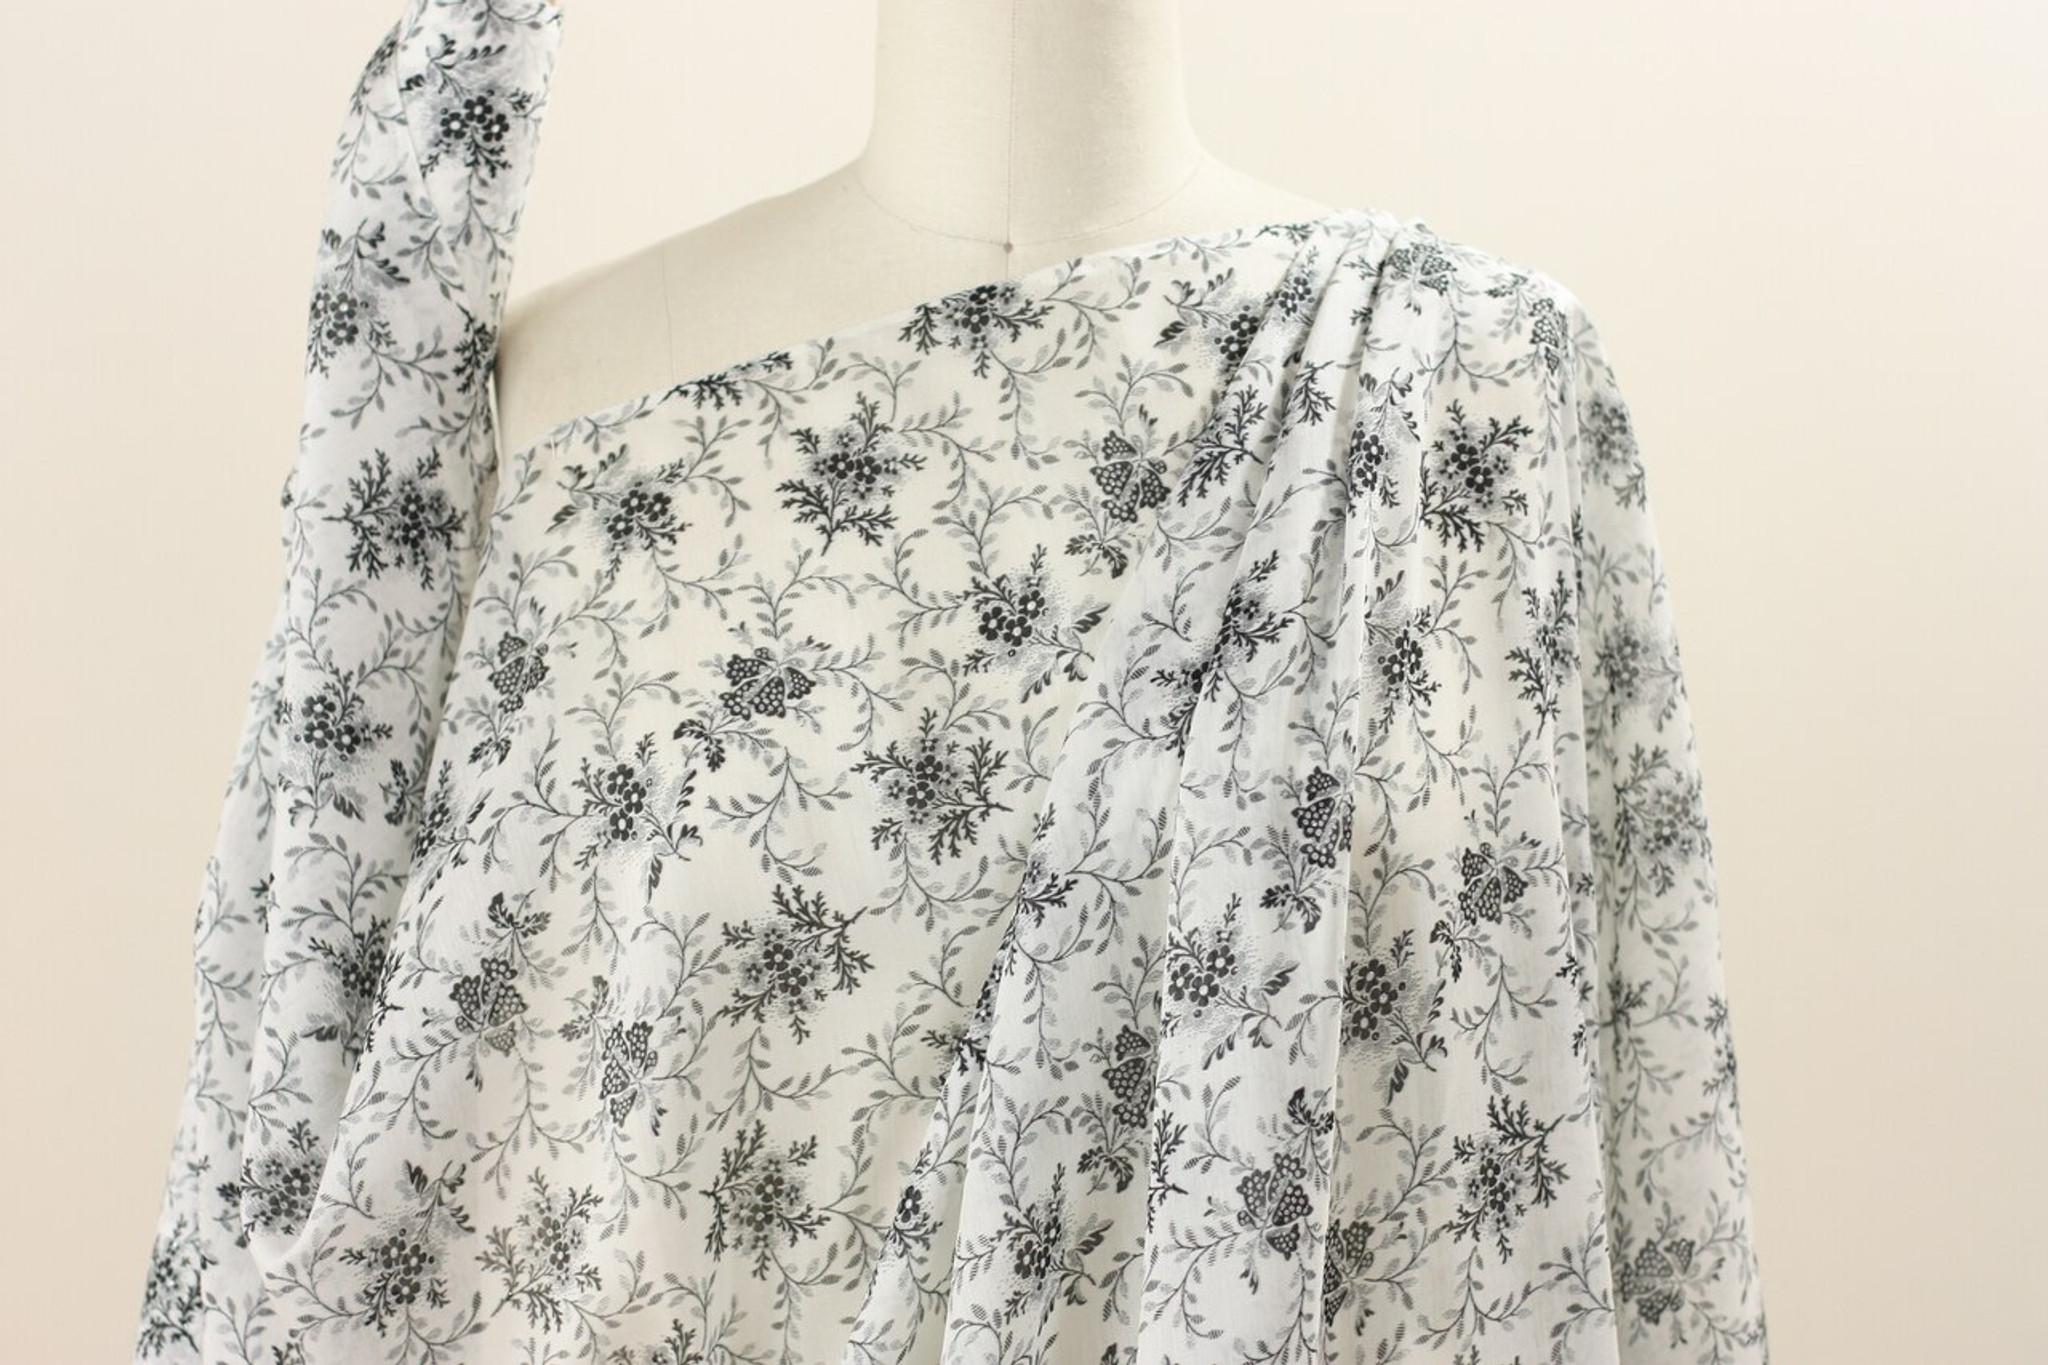 Floral Voile Silk Remnant